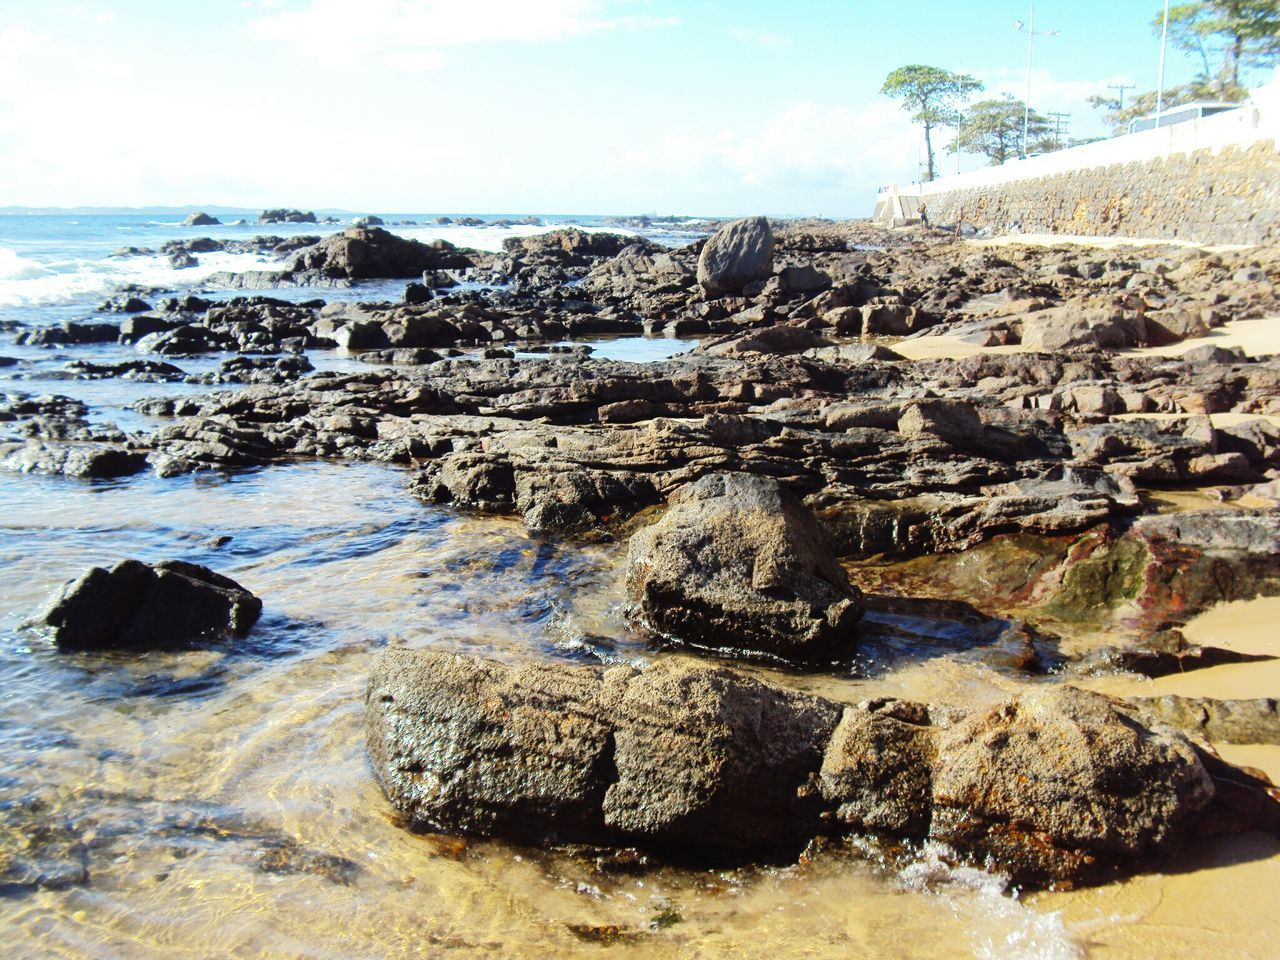 Praia Do Forte, Bahia - Brasil Salvador Bahia Brasil Brazil Beach Praia Rochas Blue Sky Clouds Sand & Sea Sand